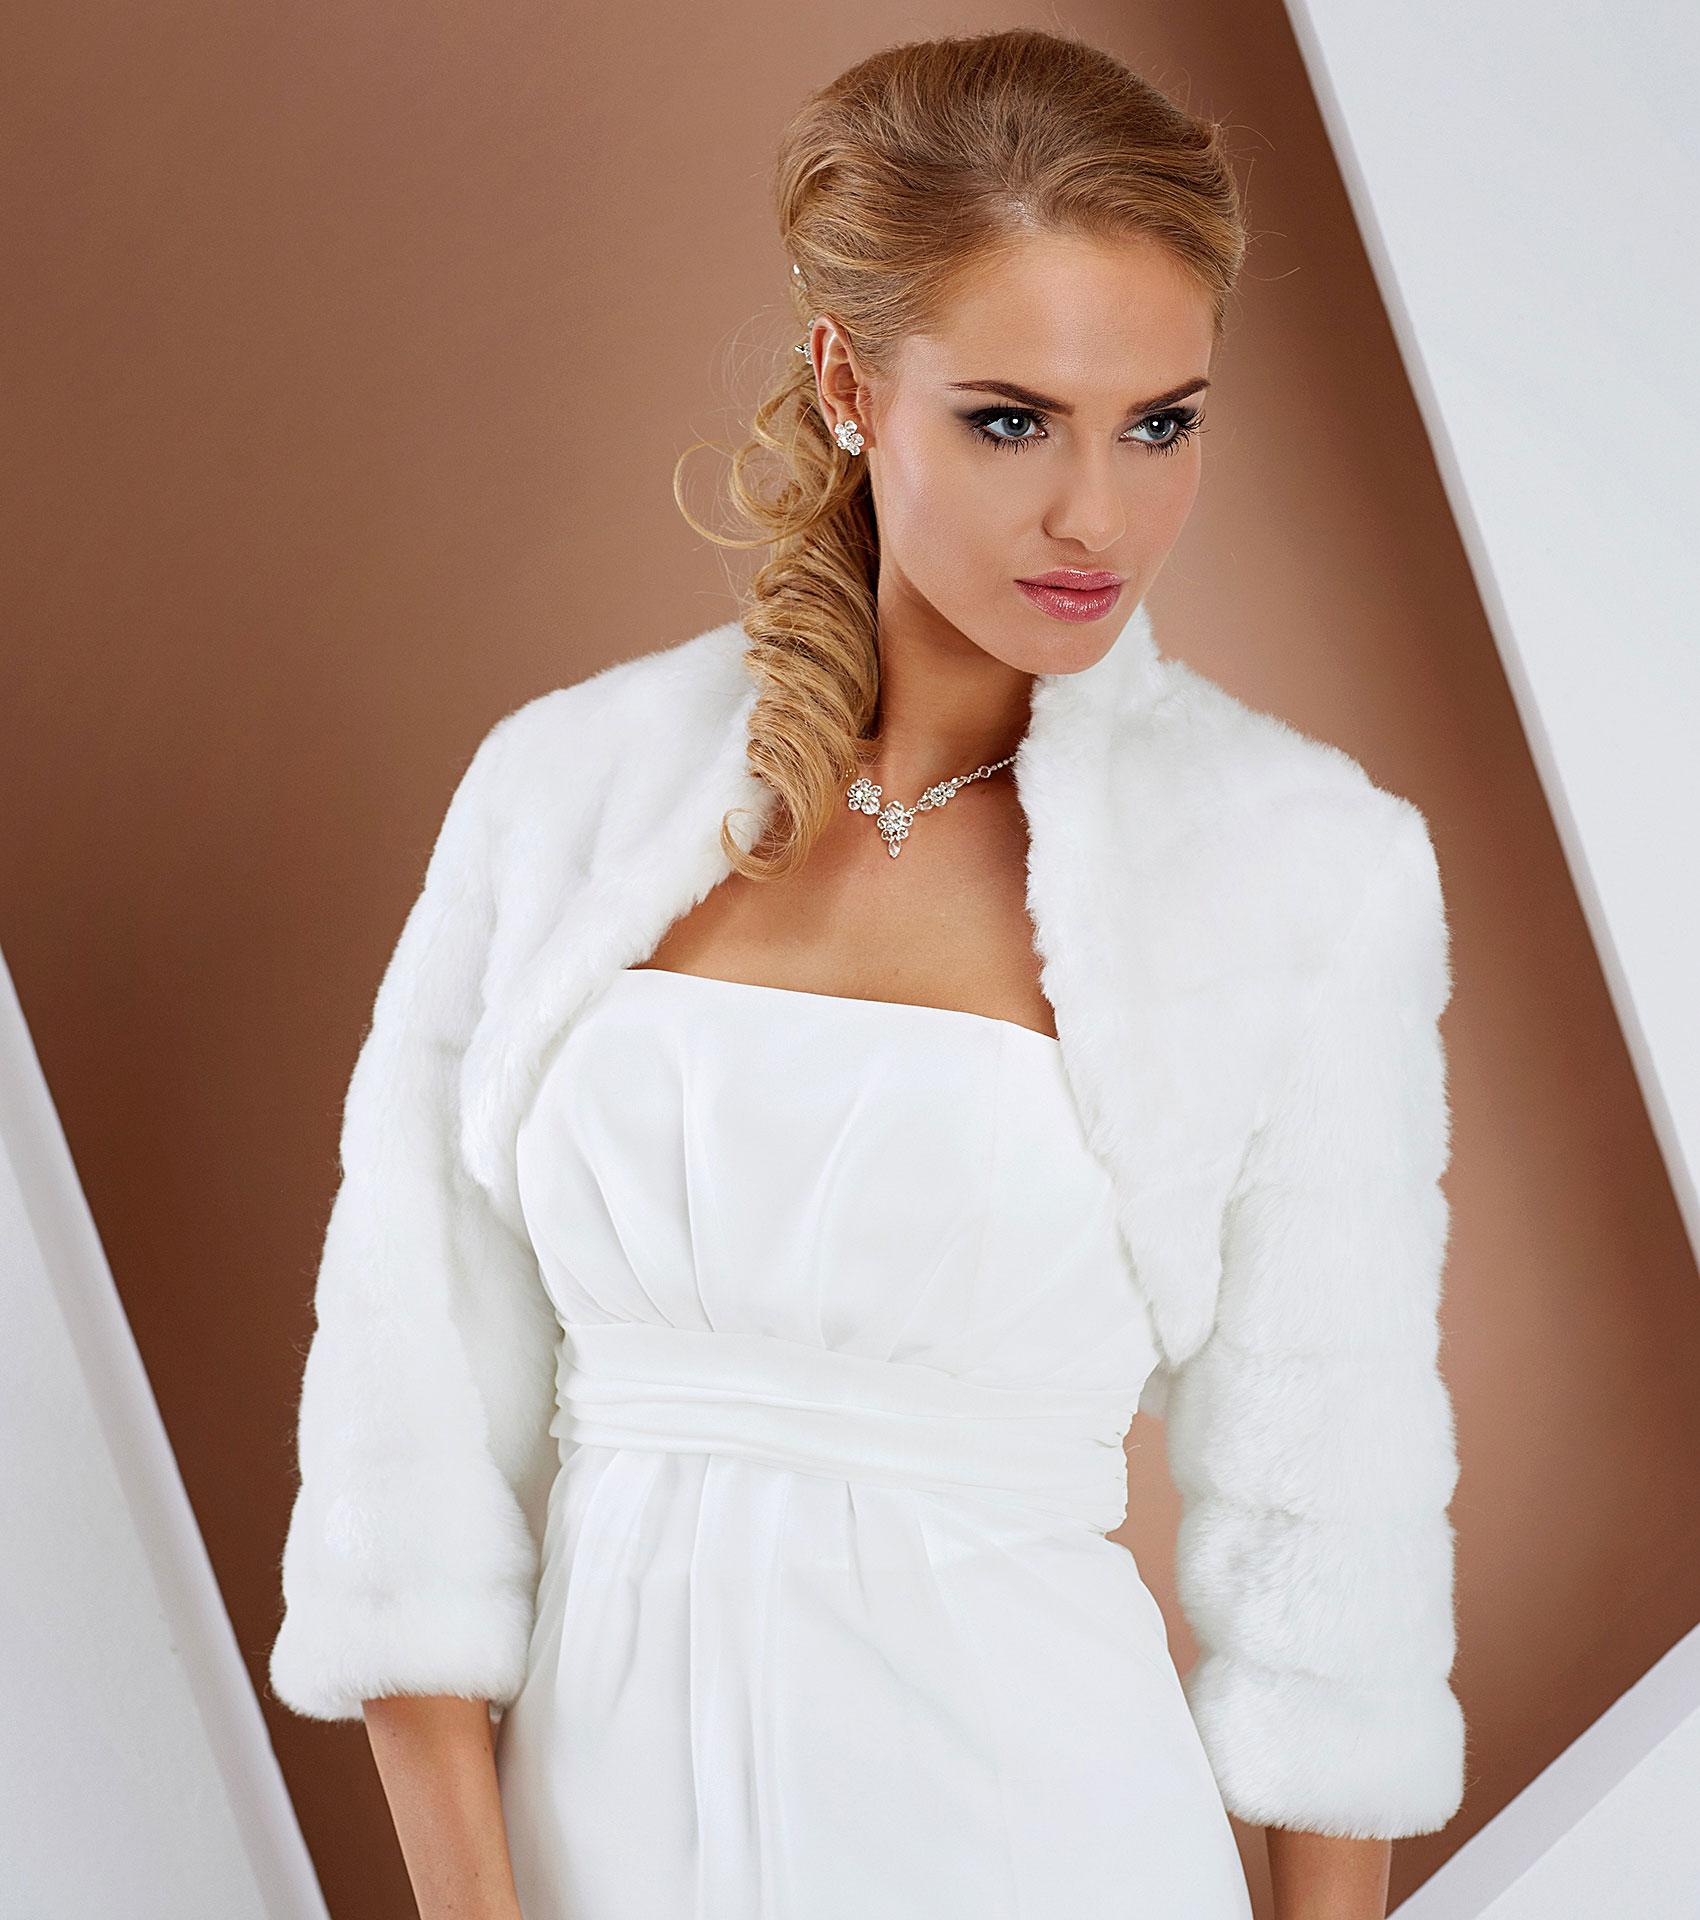 Faux Fur And Bolero Jackets - Bleu Bridal Gowns